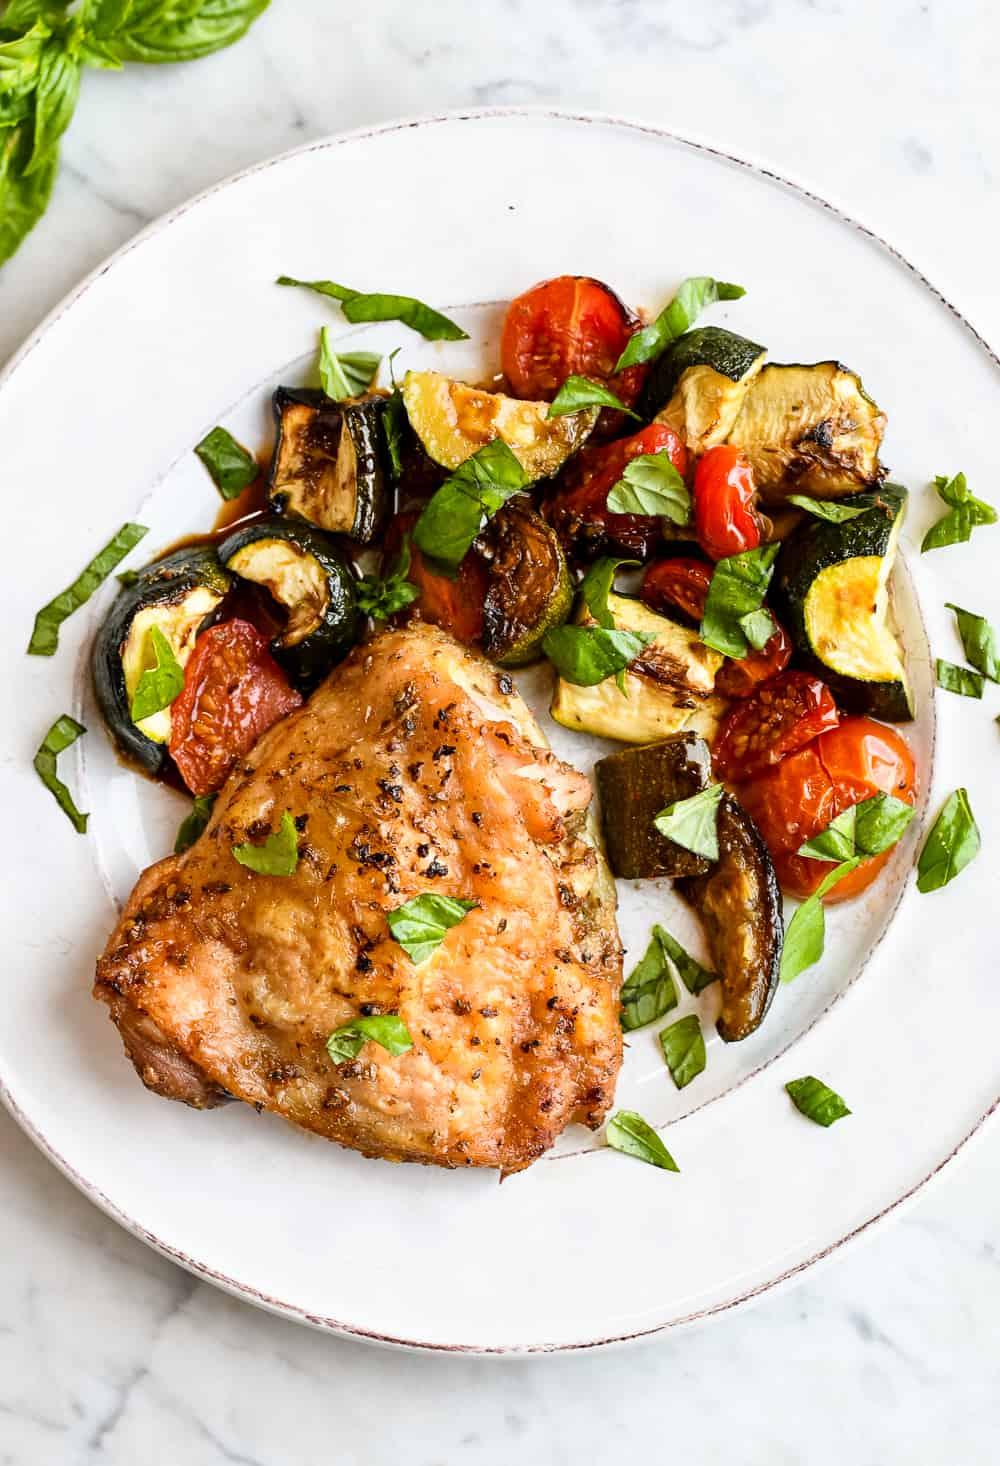 Sheet Pan Chicken with Zucchini Tomatoes & Basil plate